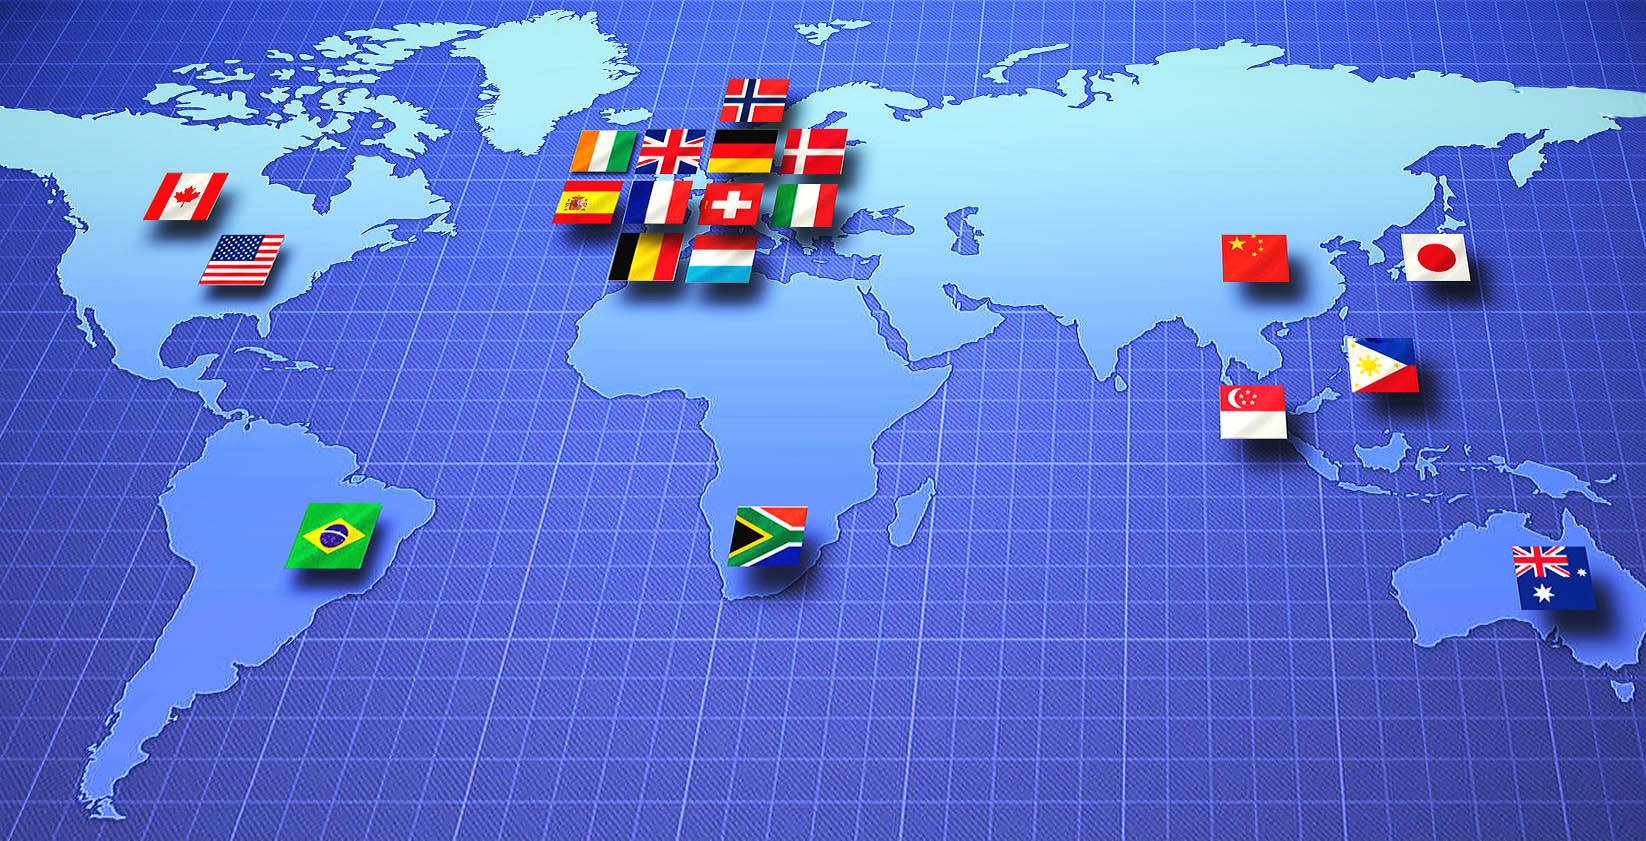 world map infographic poster robert rusin flickr